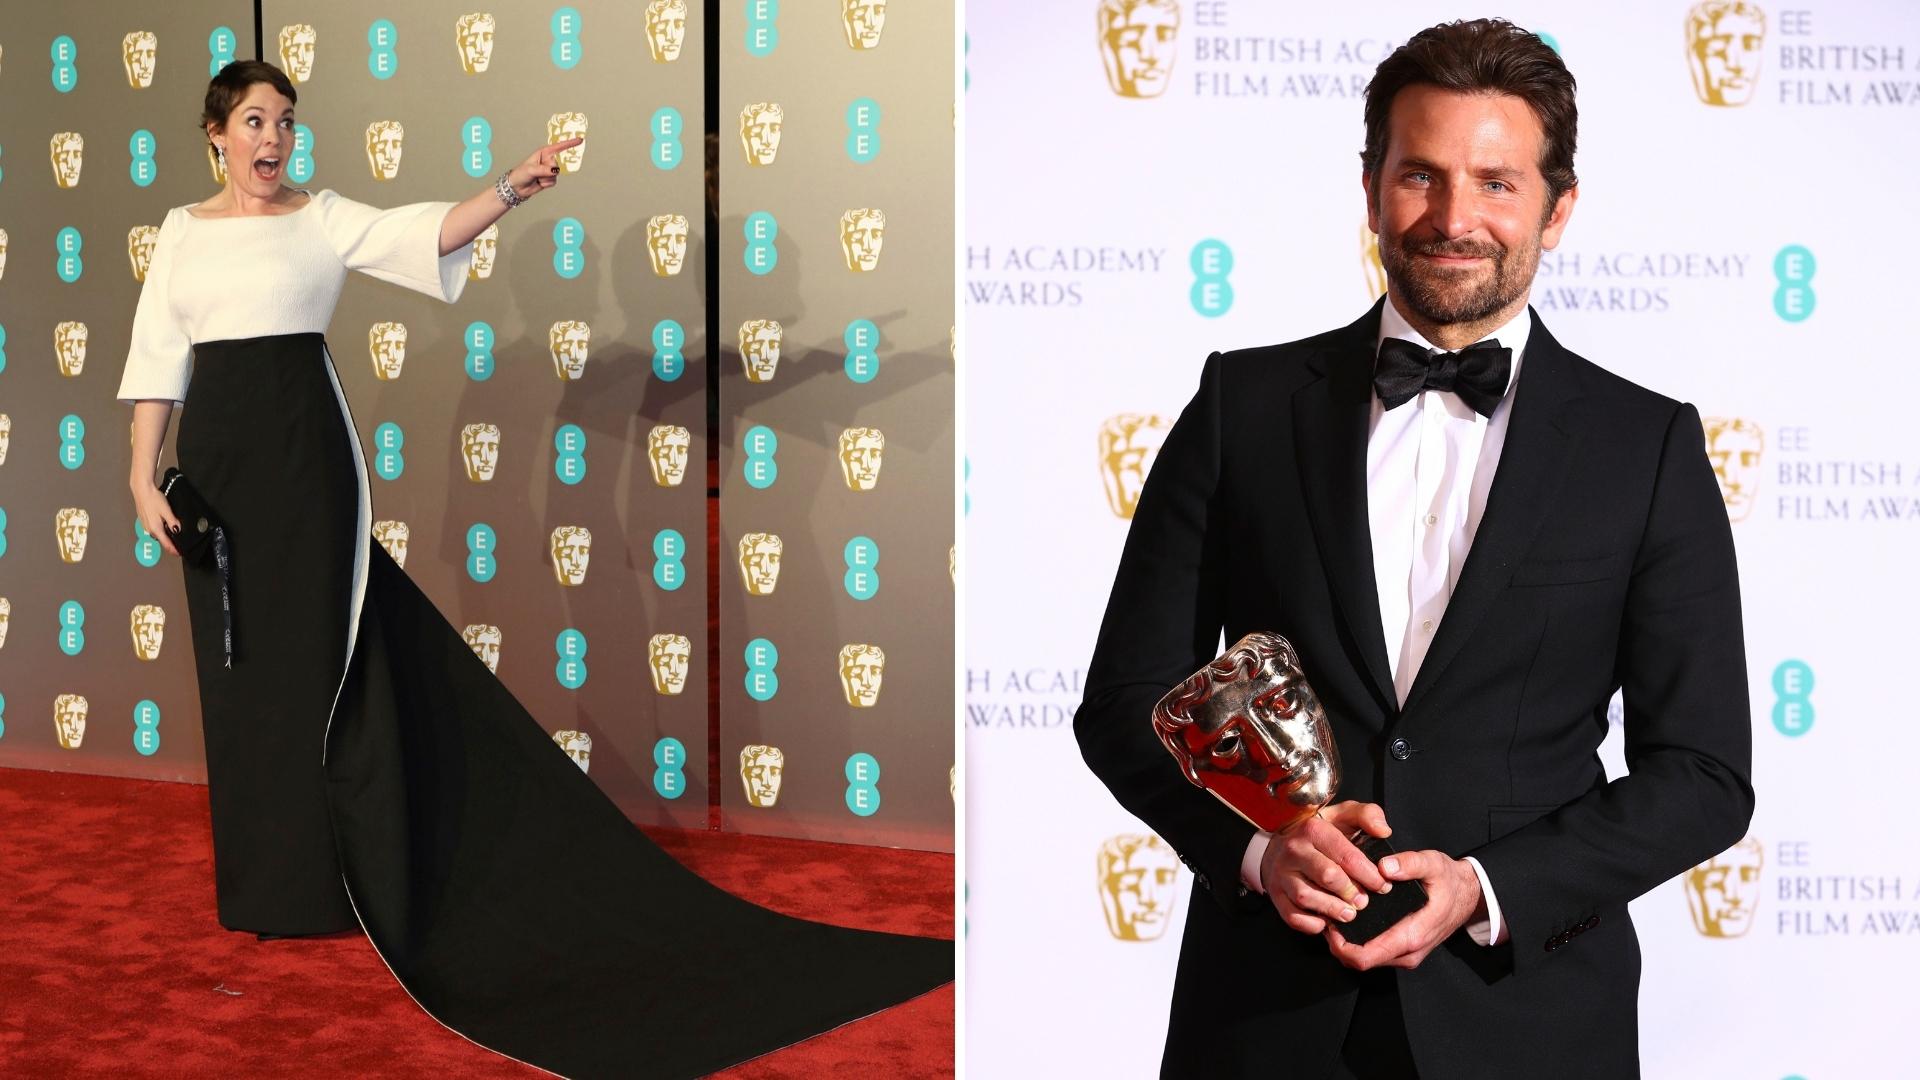 BAFTA Awards 2019: Who Won What At 2019 BAFTA Film Awards